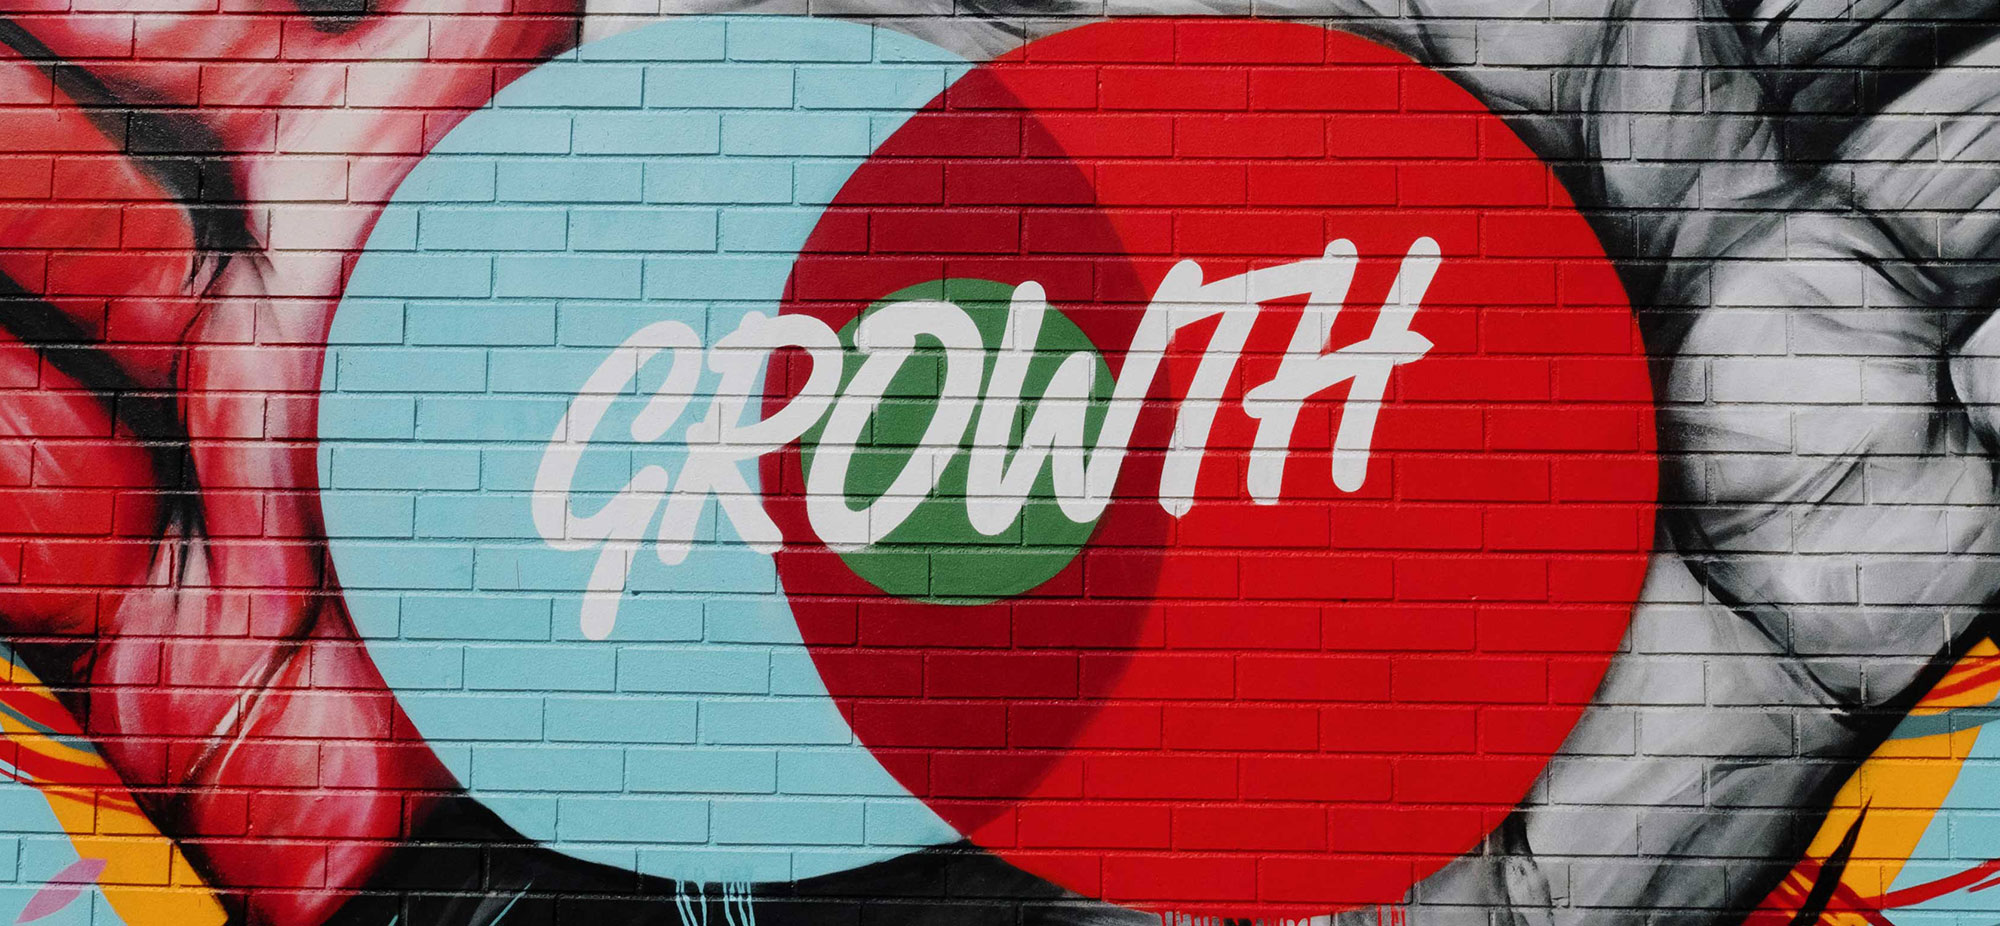 Growth mural